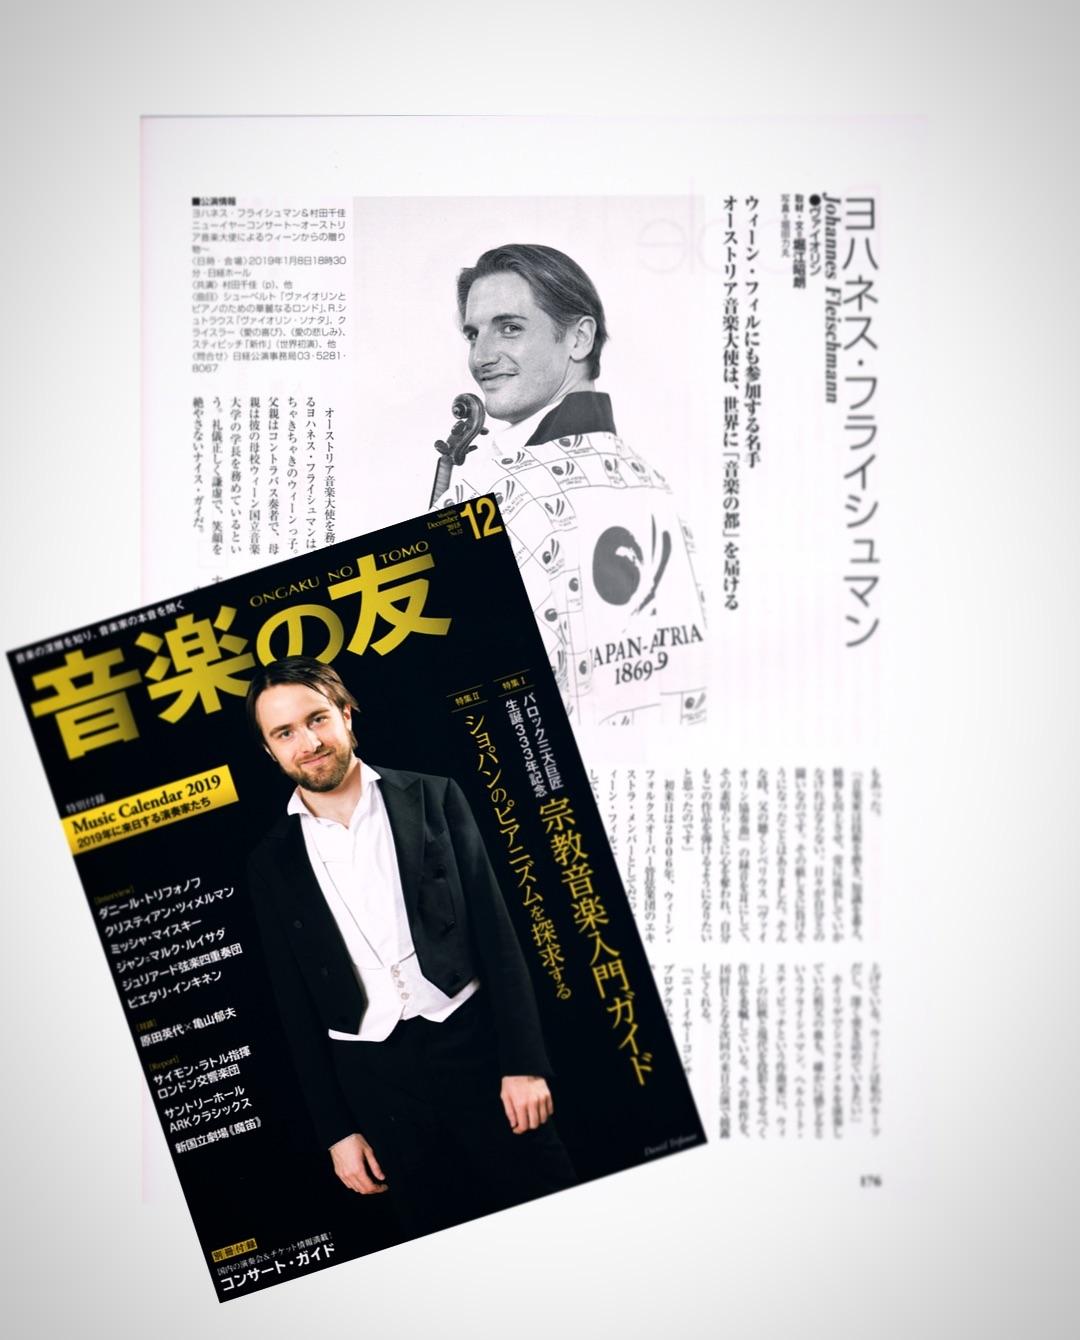 johannes-fleischmann-japan.jpg